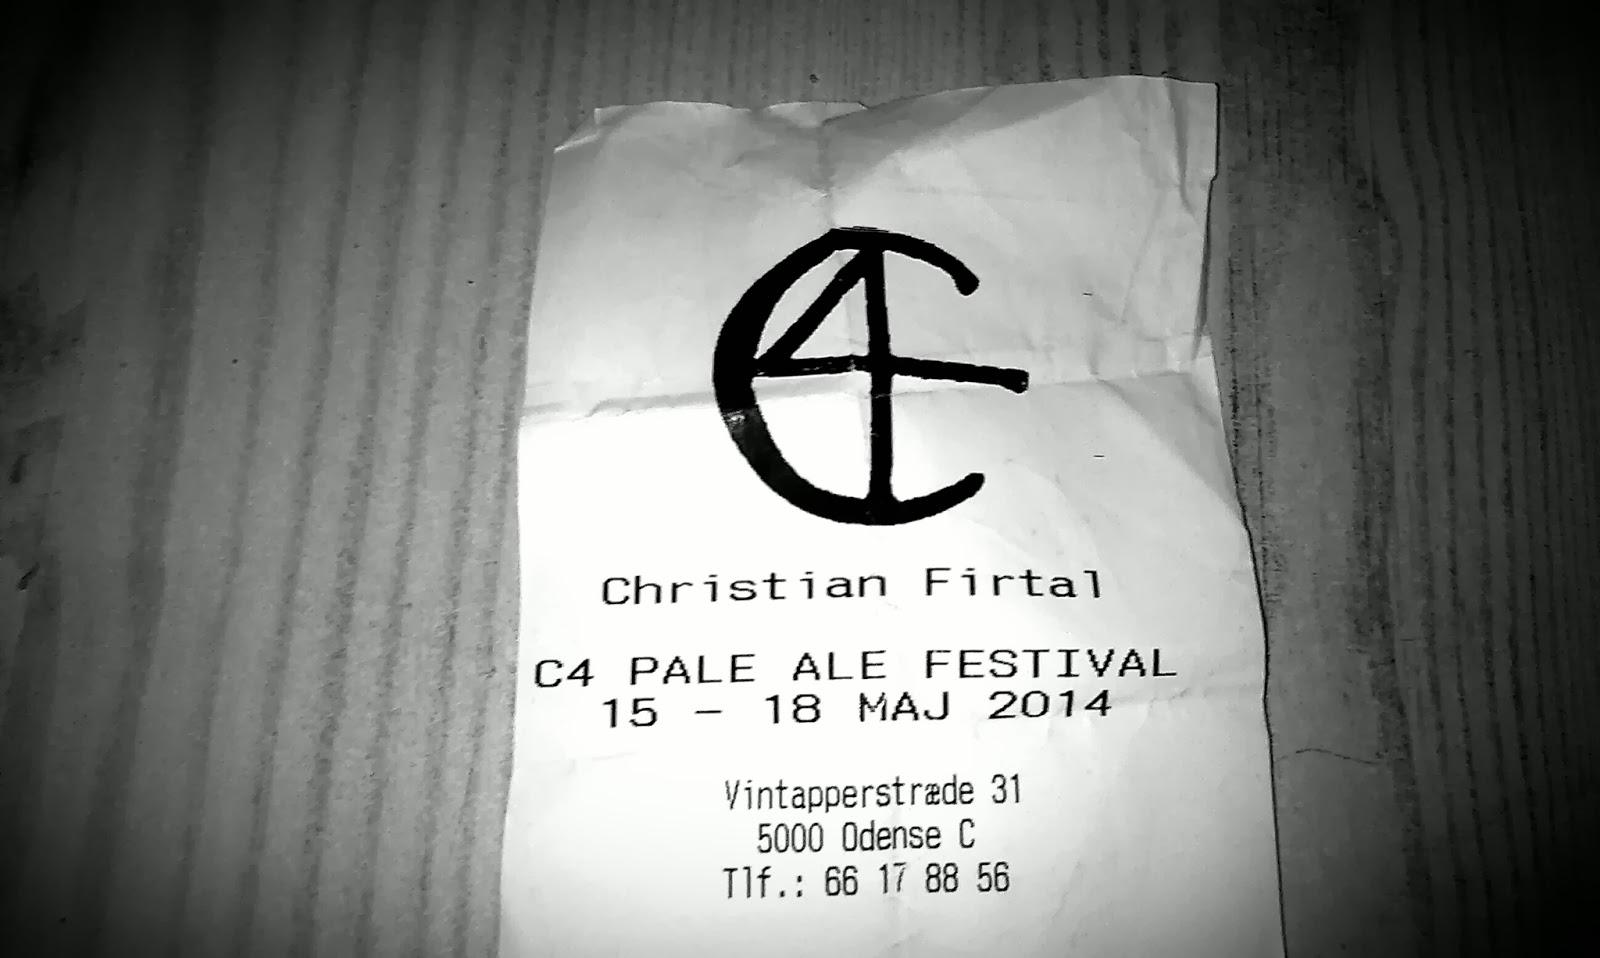 pale ale festival christian firtal